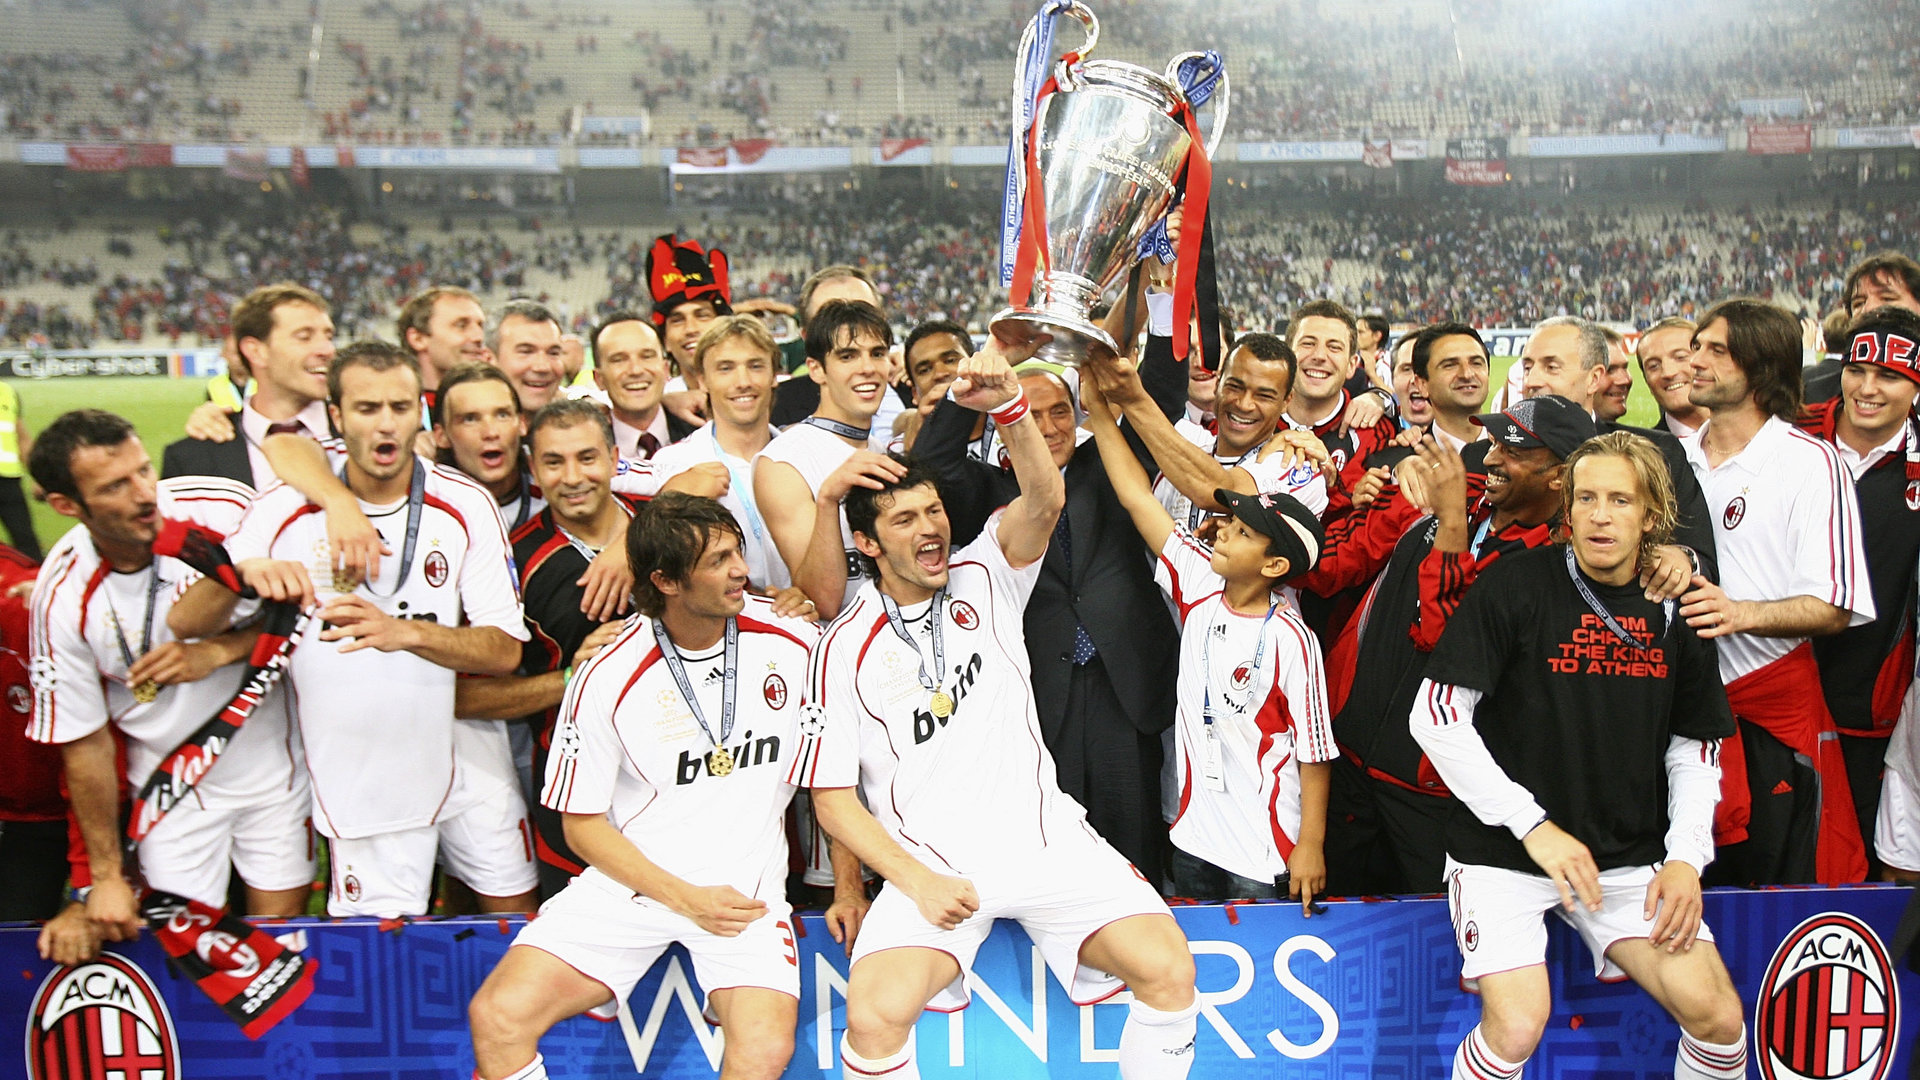 ac milan 2007 champions league final